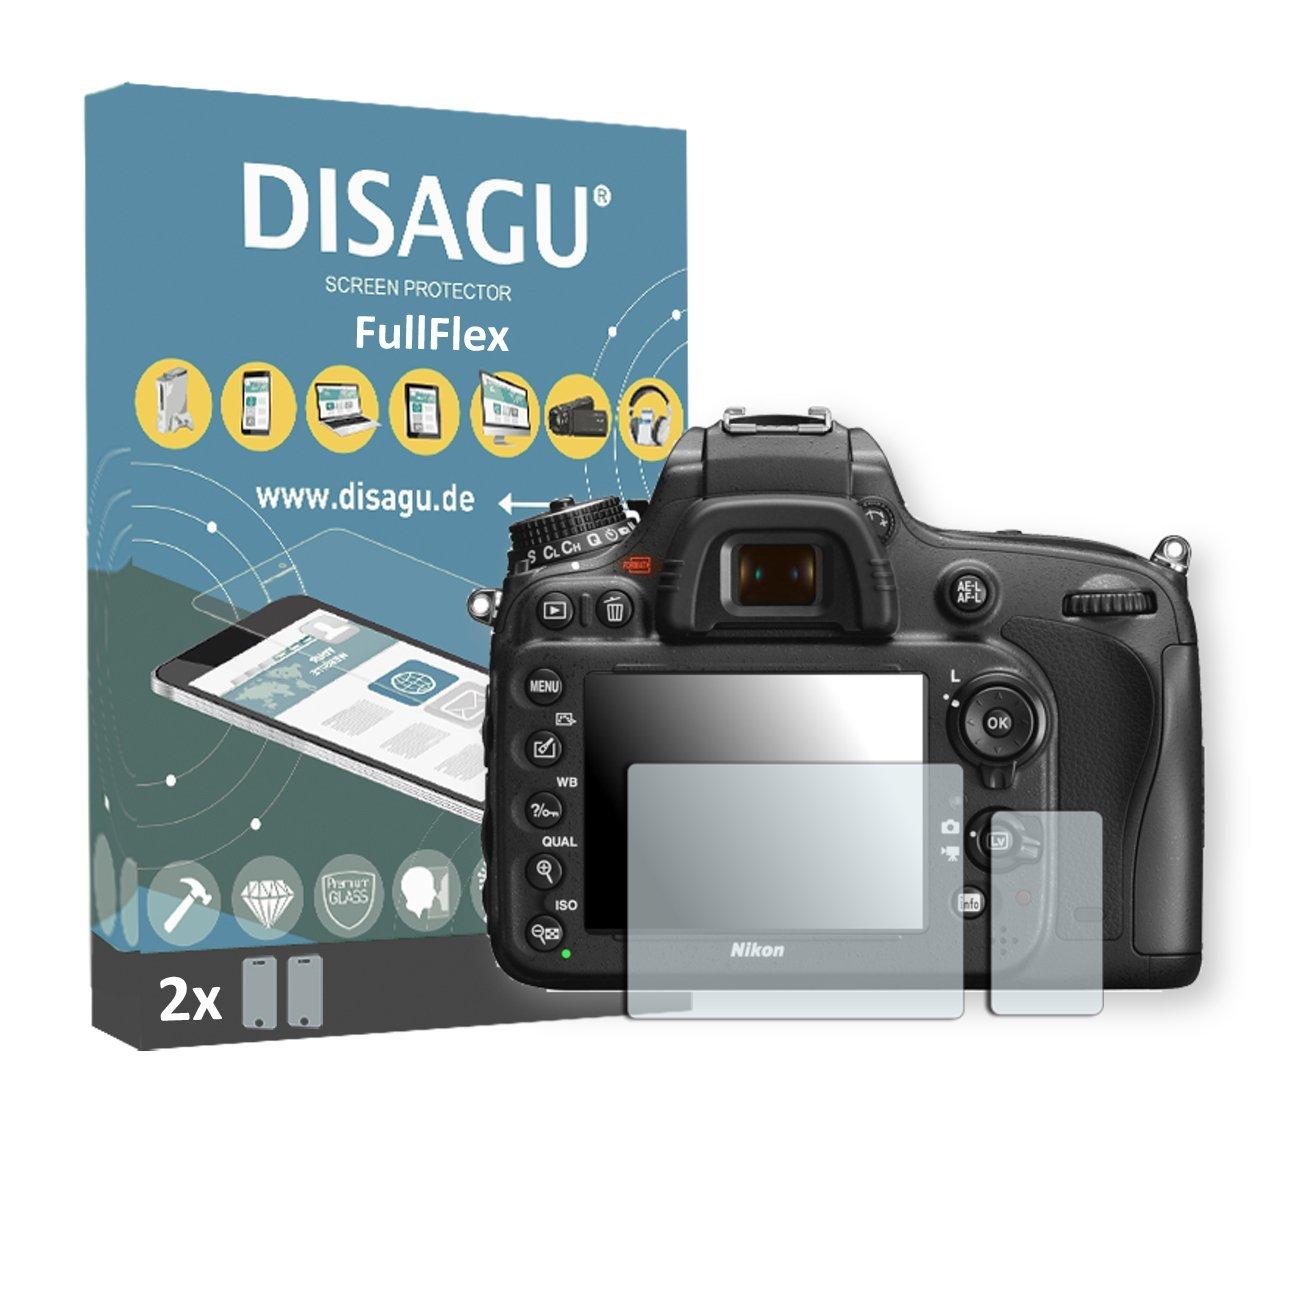 2 x Disagu FullFlex screen protector for Nikon D600 foil screen protector